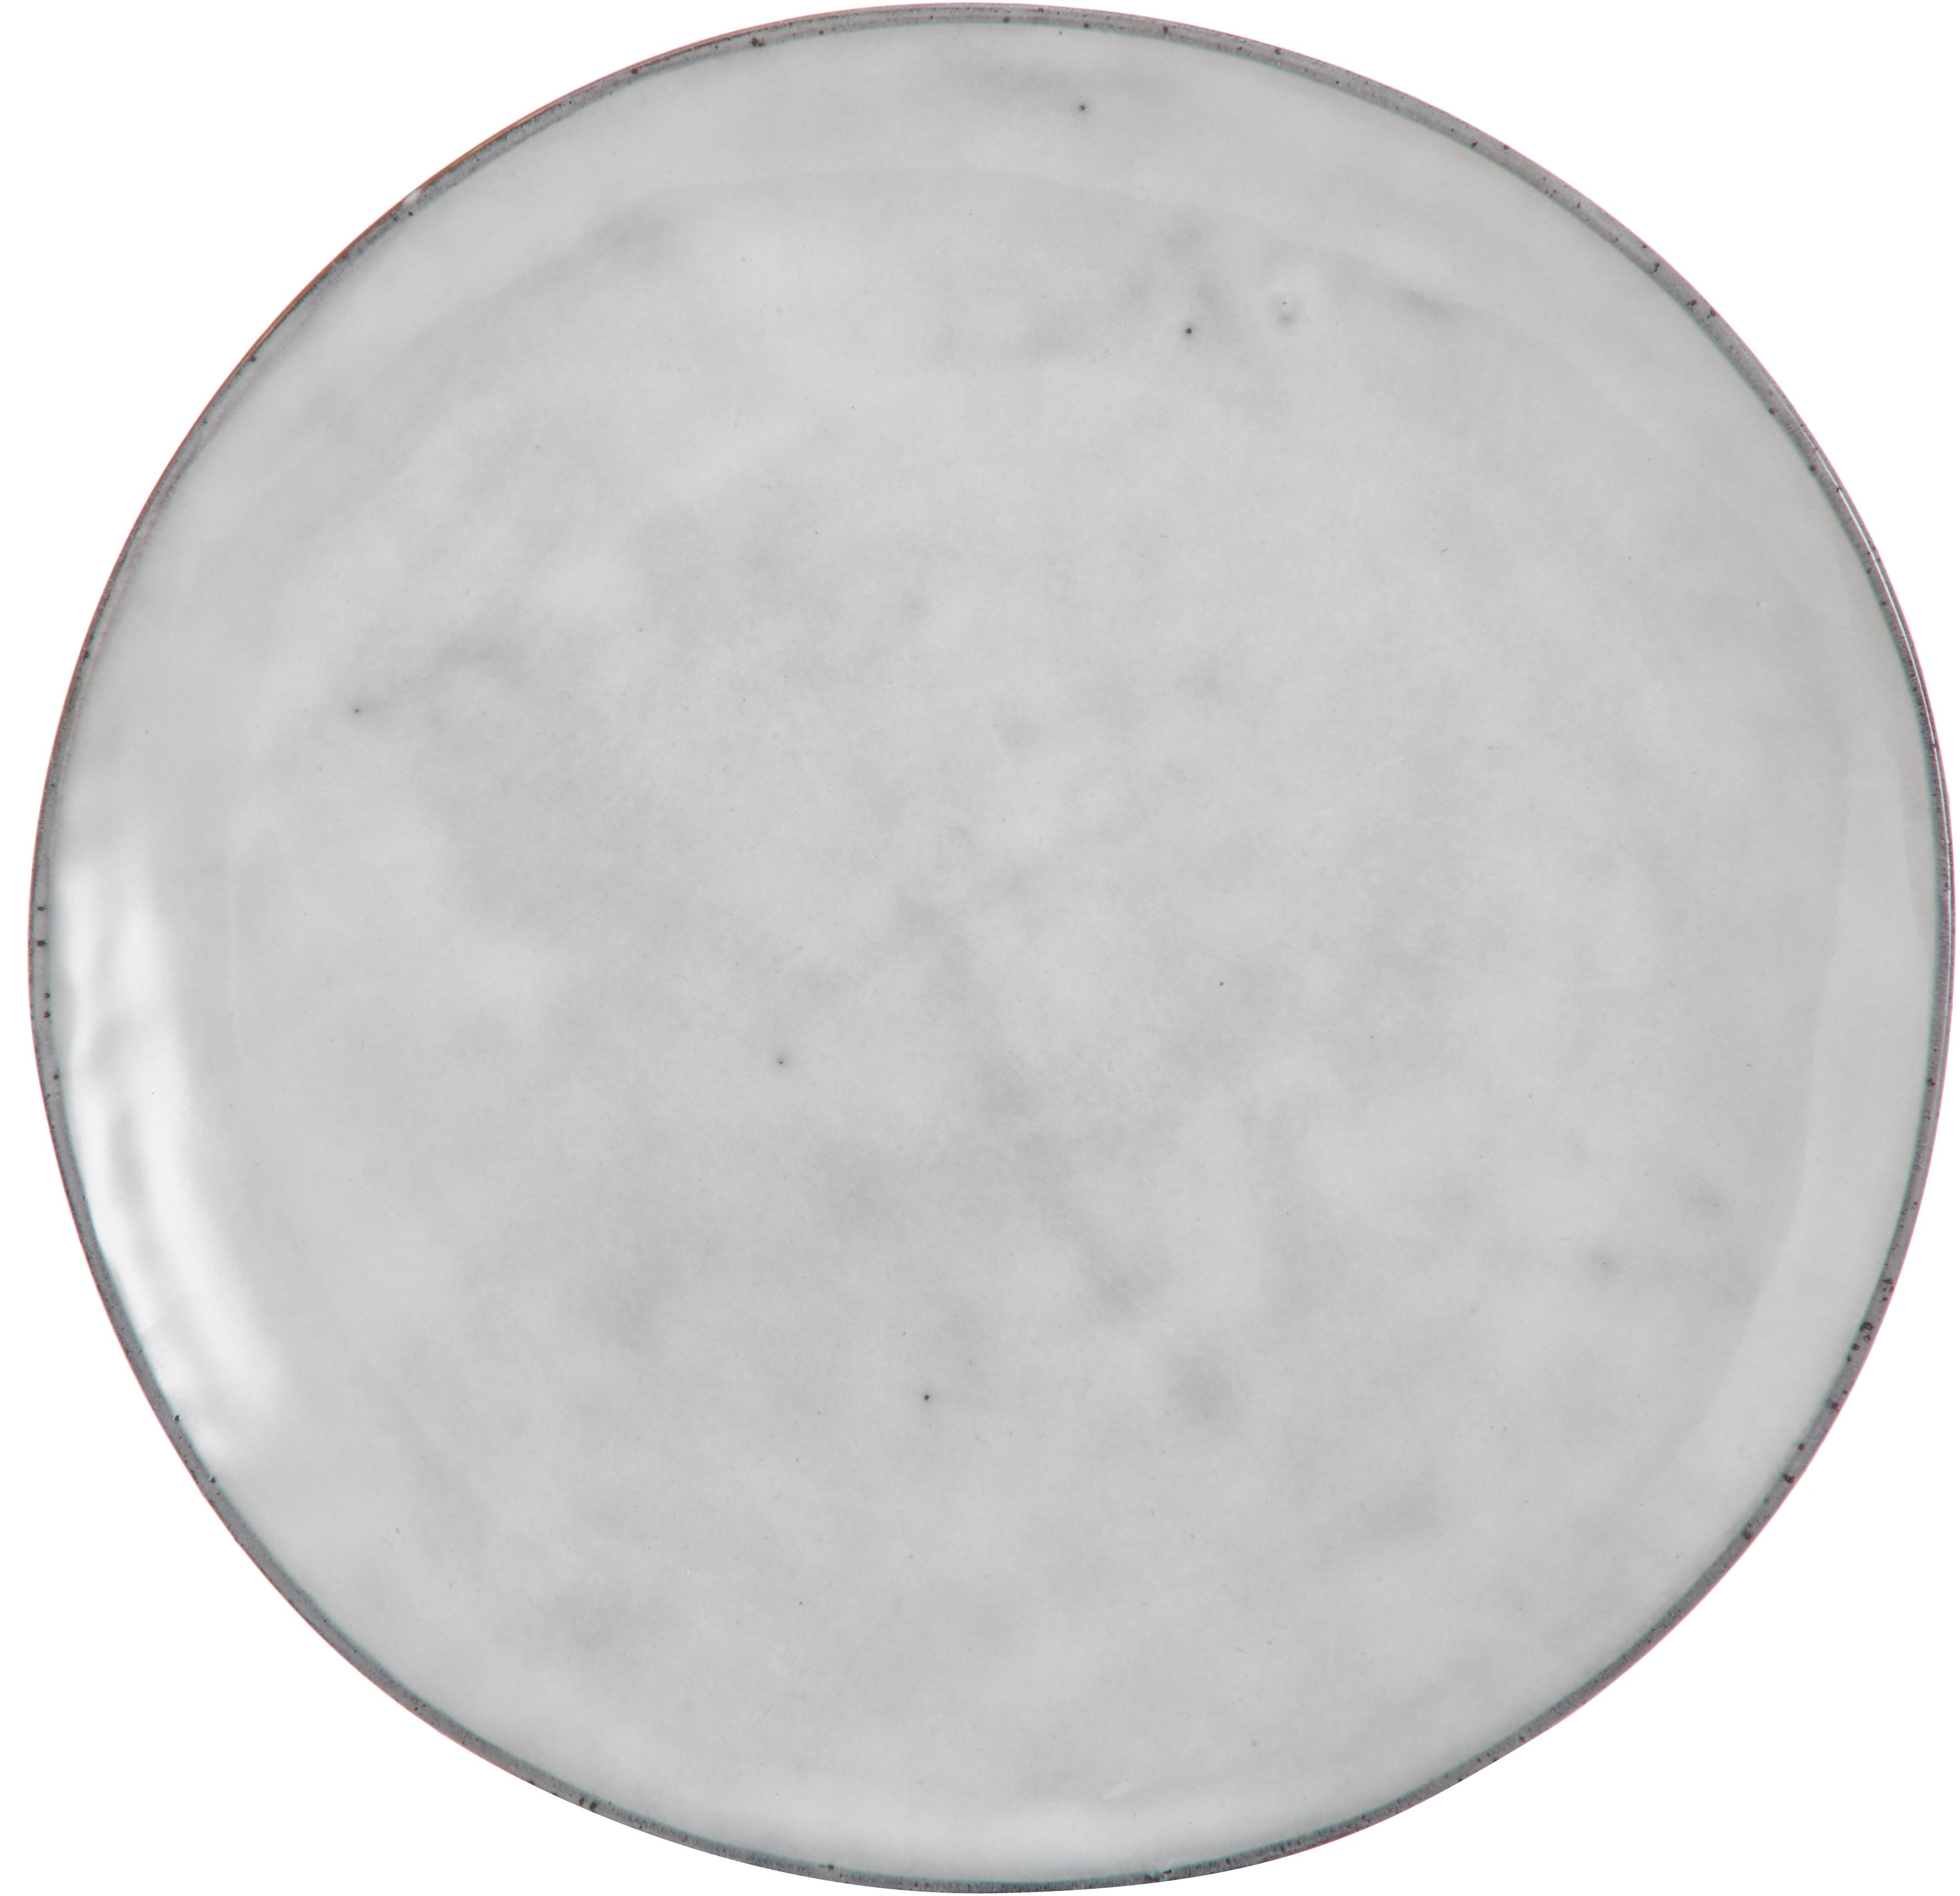 Handgemaakte dinerborden Nordic Sand, 4 stuks, Keramiek, Zandkleurig, Ø 26 x H 3 cm